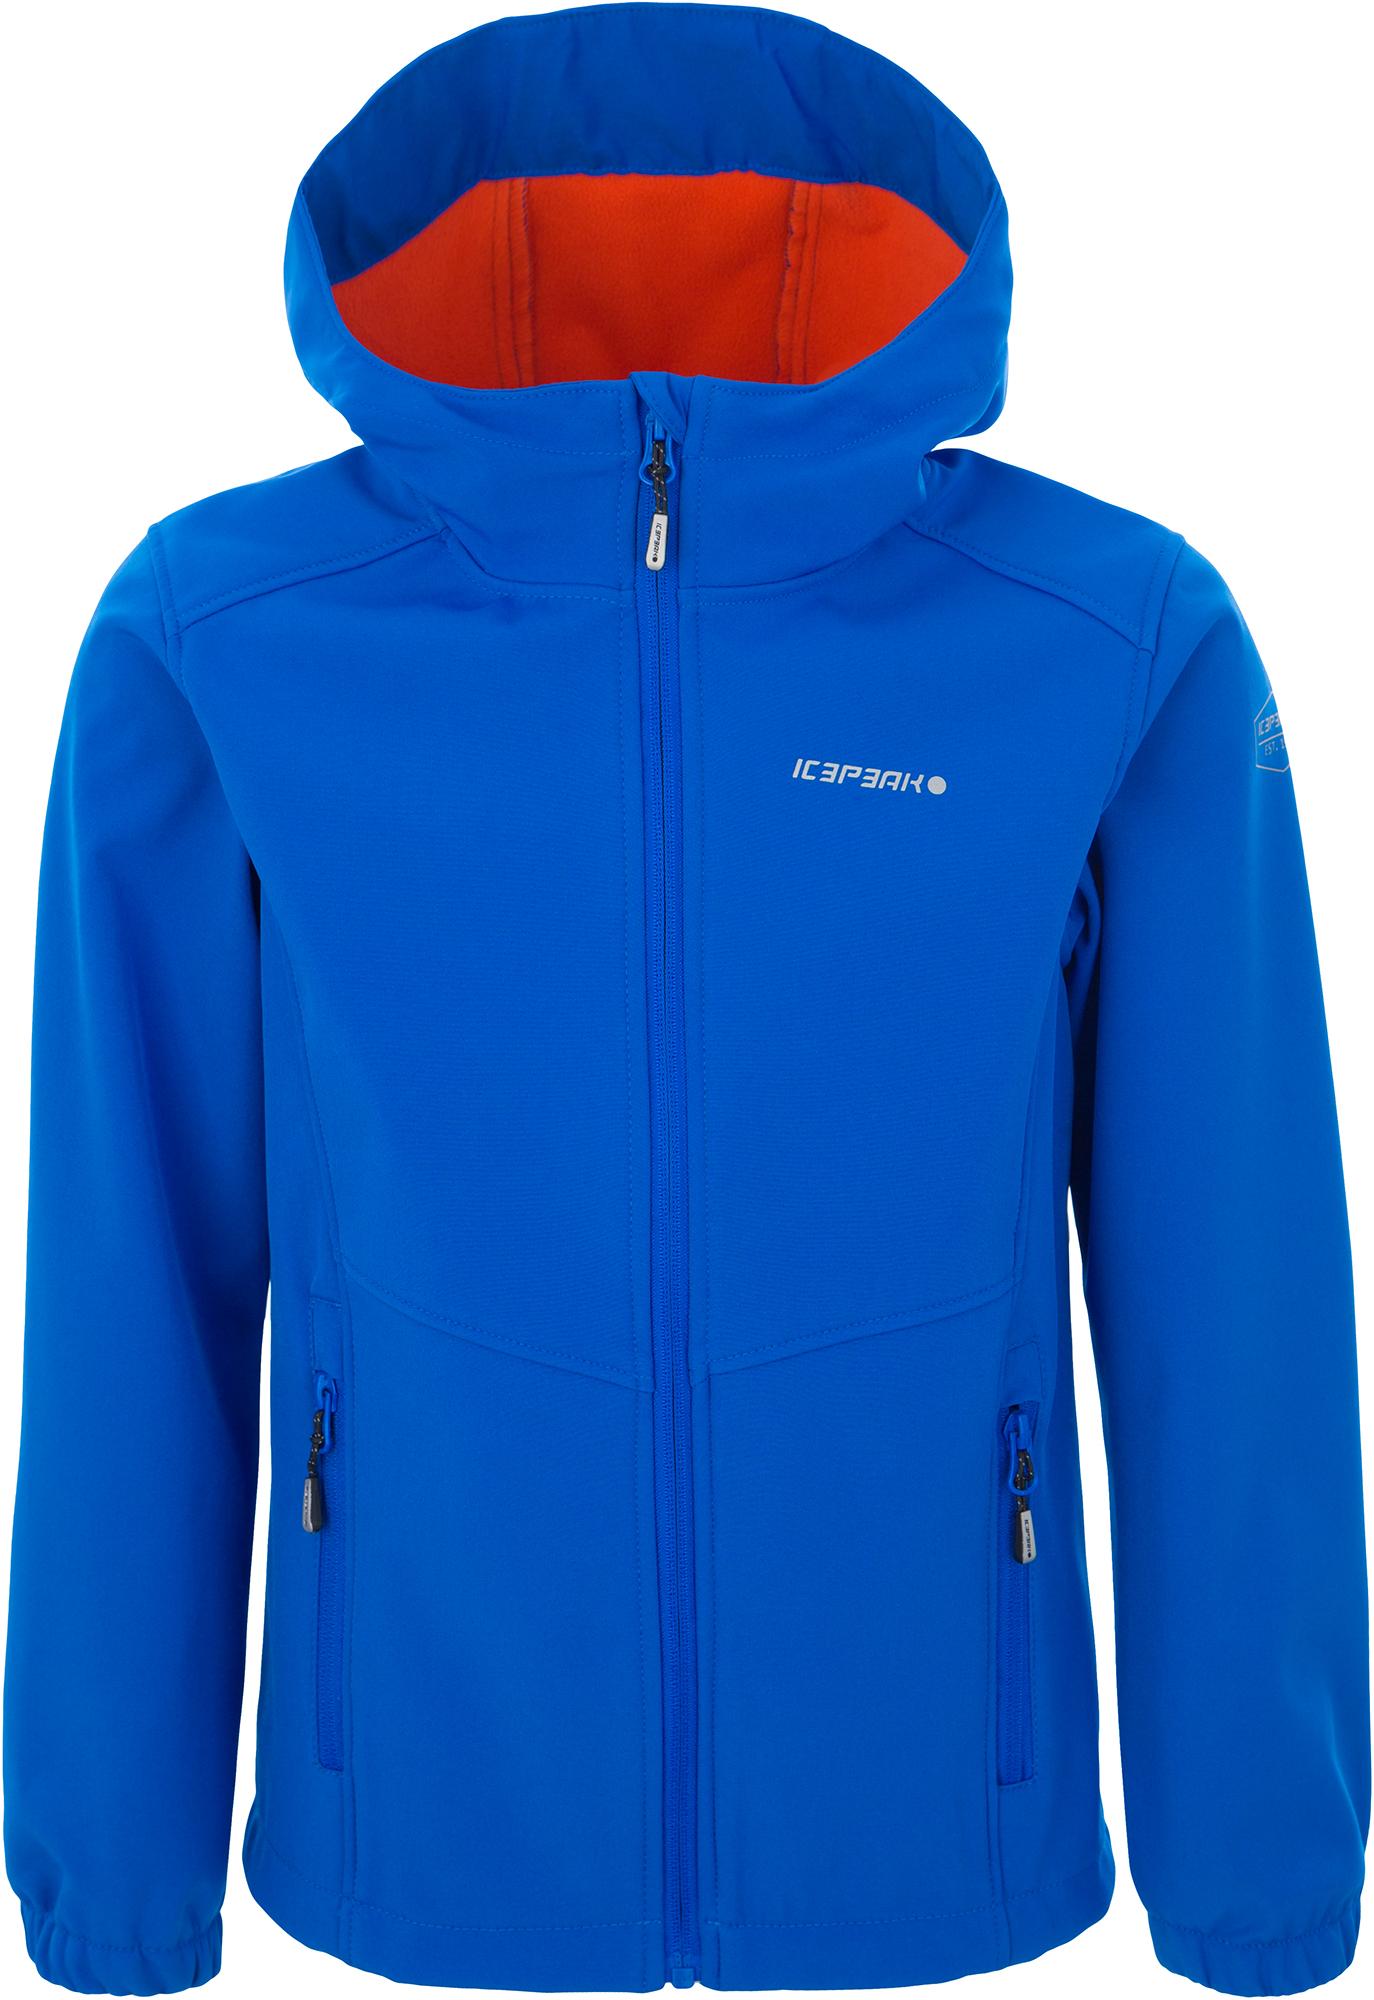 IcePeak Куртка софт-шелл для мальчиков IcePeak Teiko, размер 176 icepeak перчатки для мальчиков icepeak ivy размер без размера